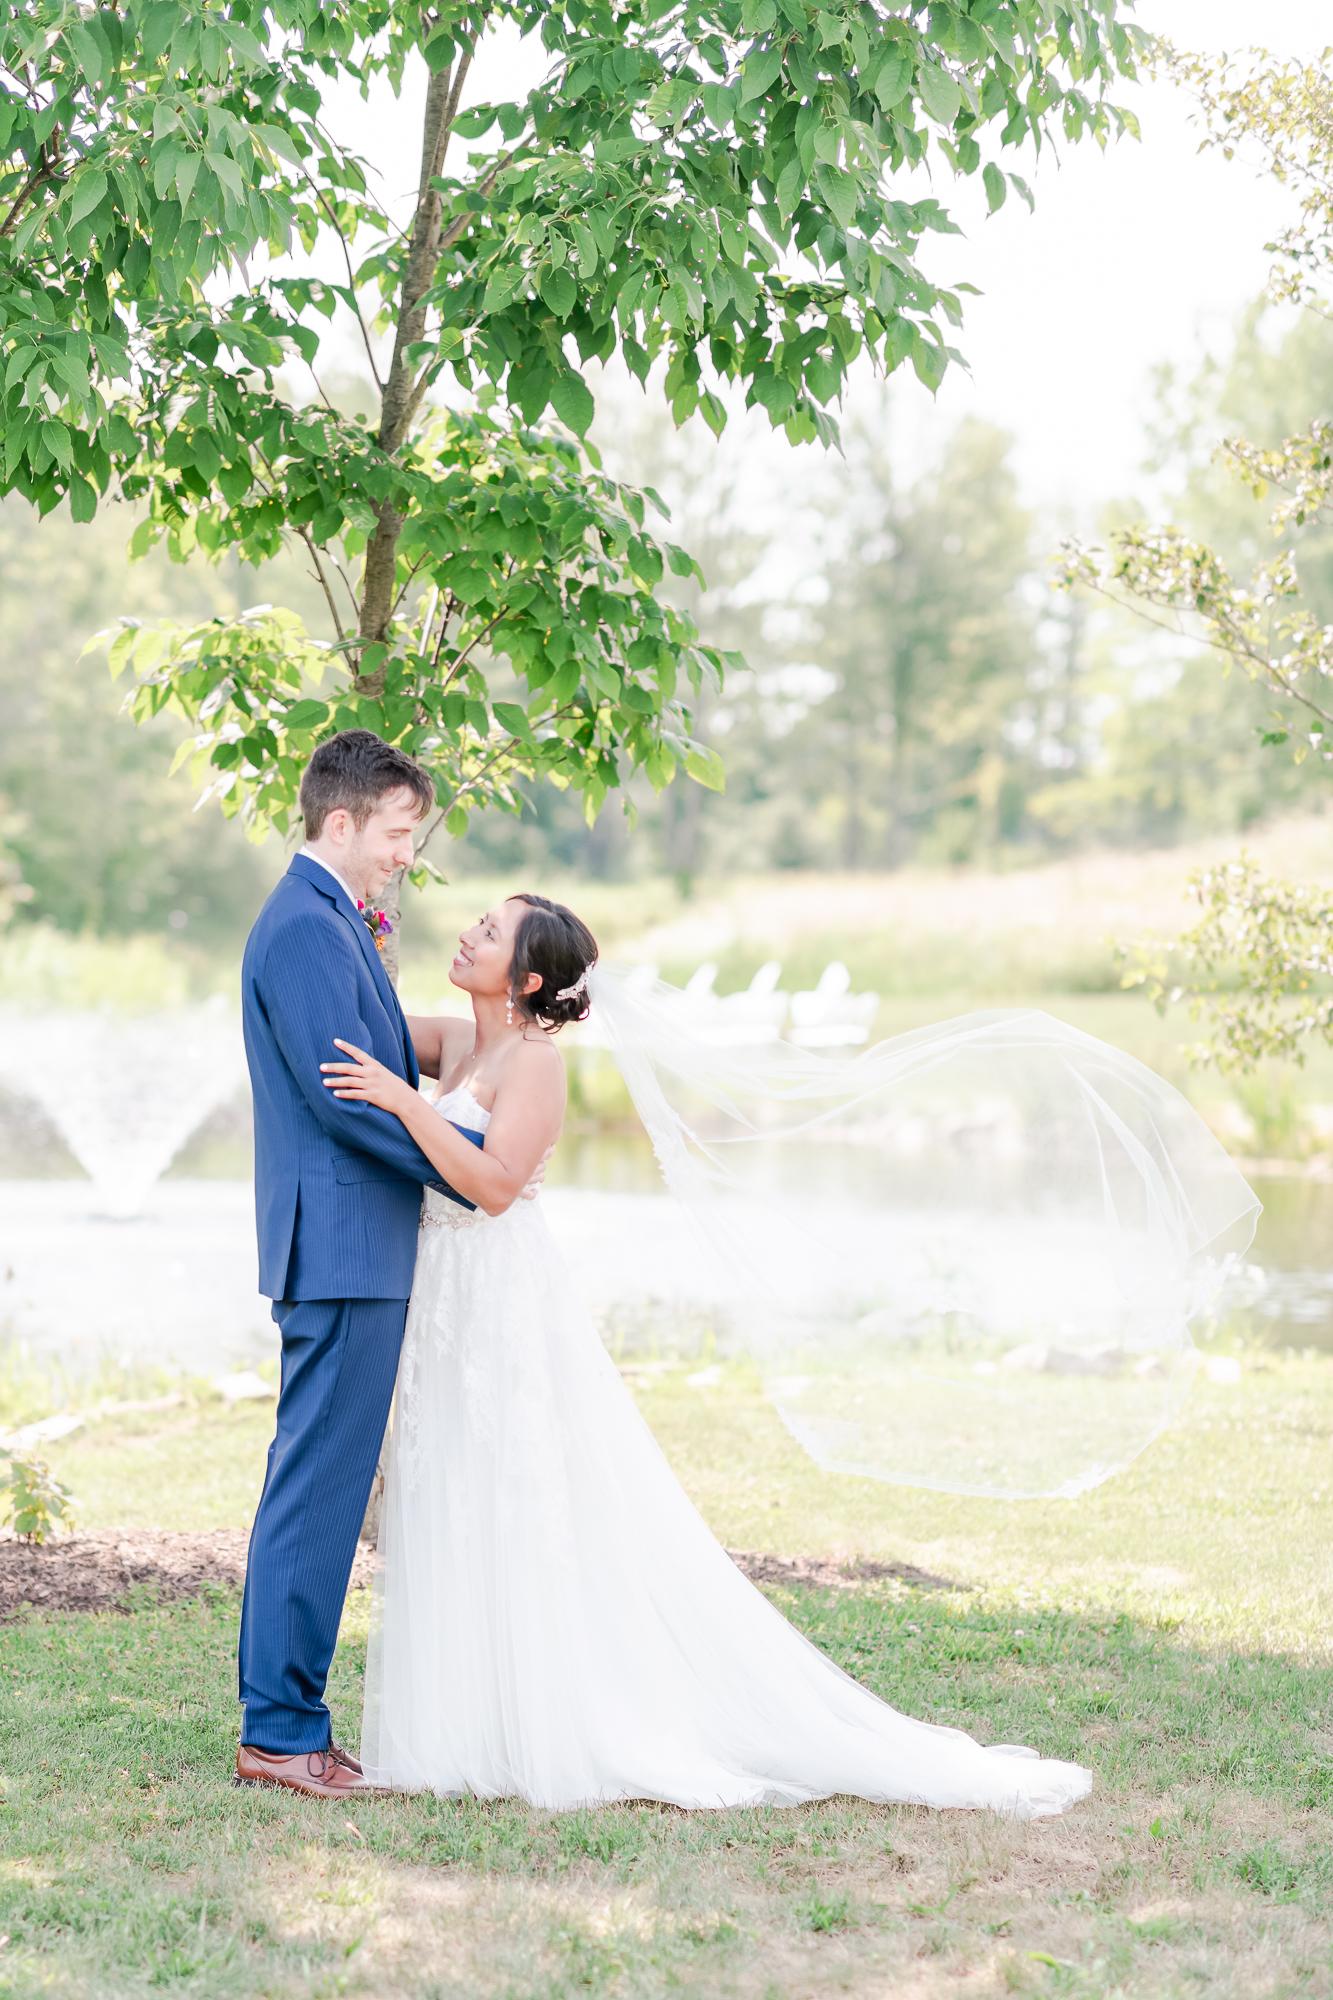 Maria+Adam_Summer Barn Wedding_The Barn and The North Star Preserve_Oberlin_Ohio-116.jpg